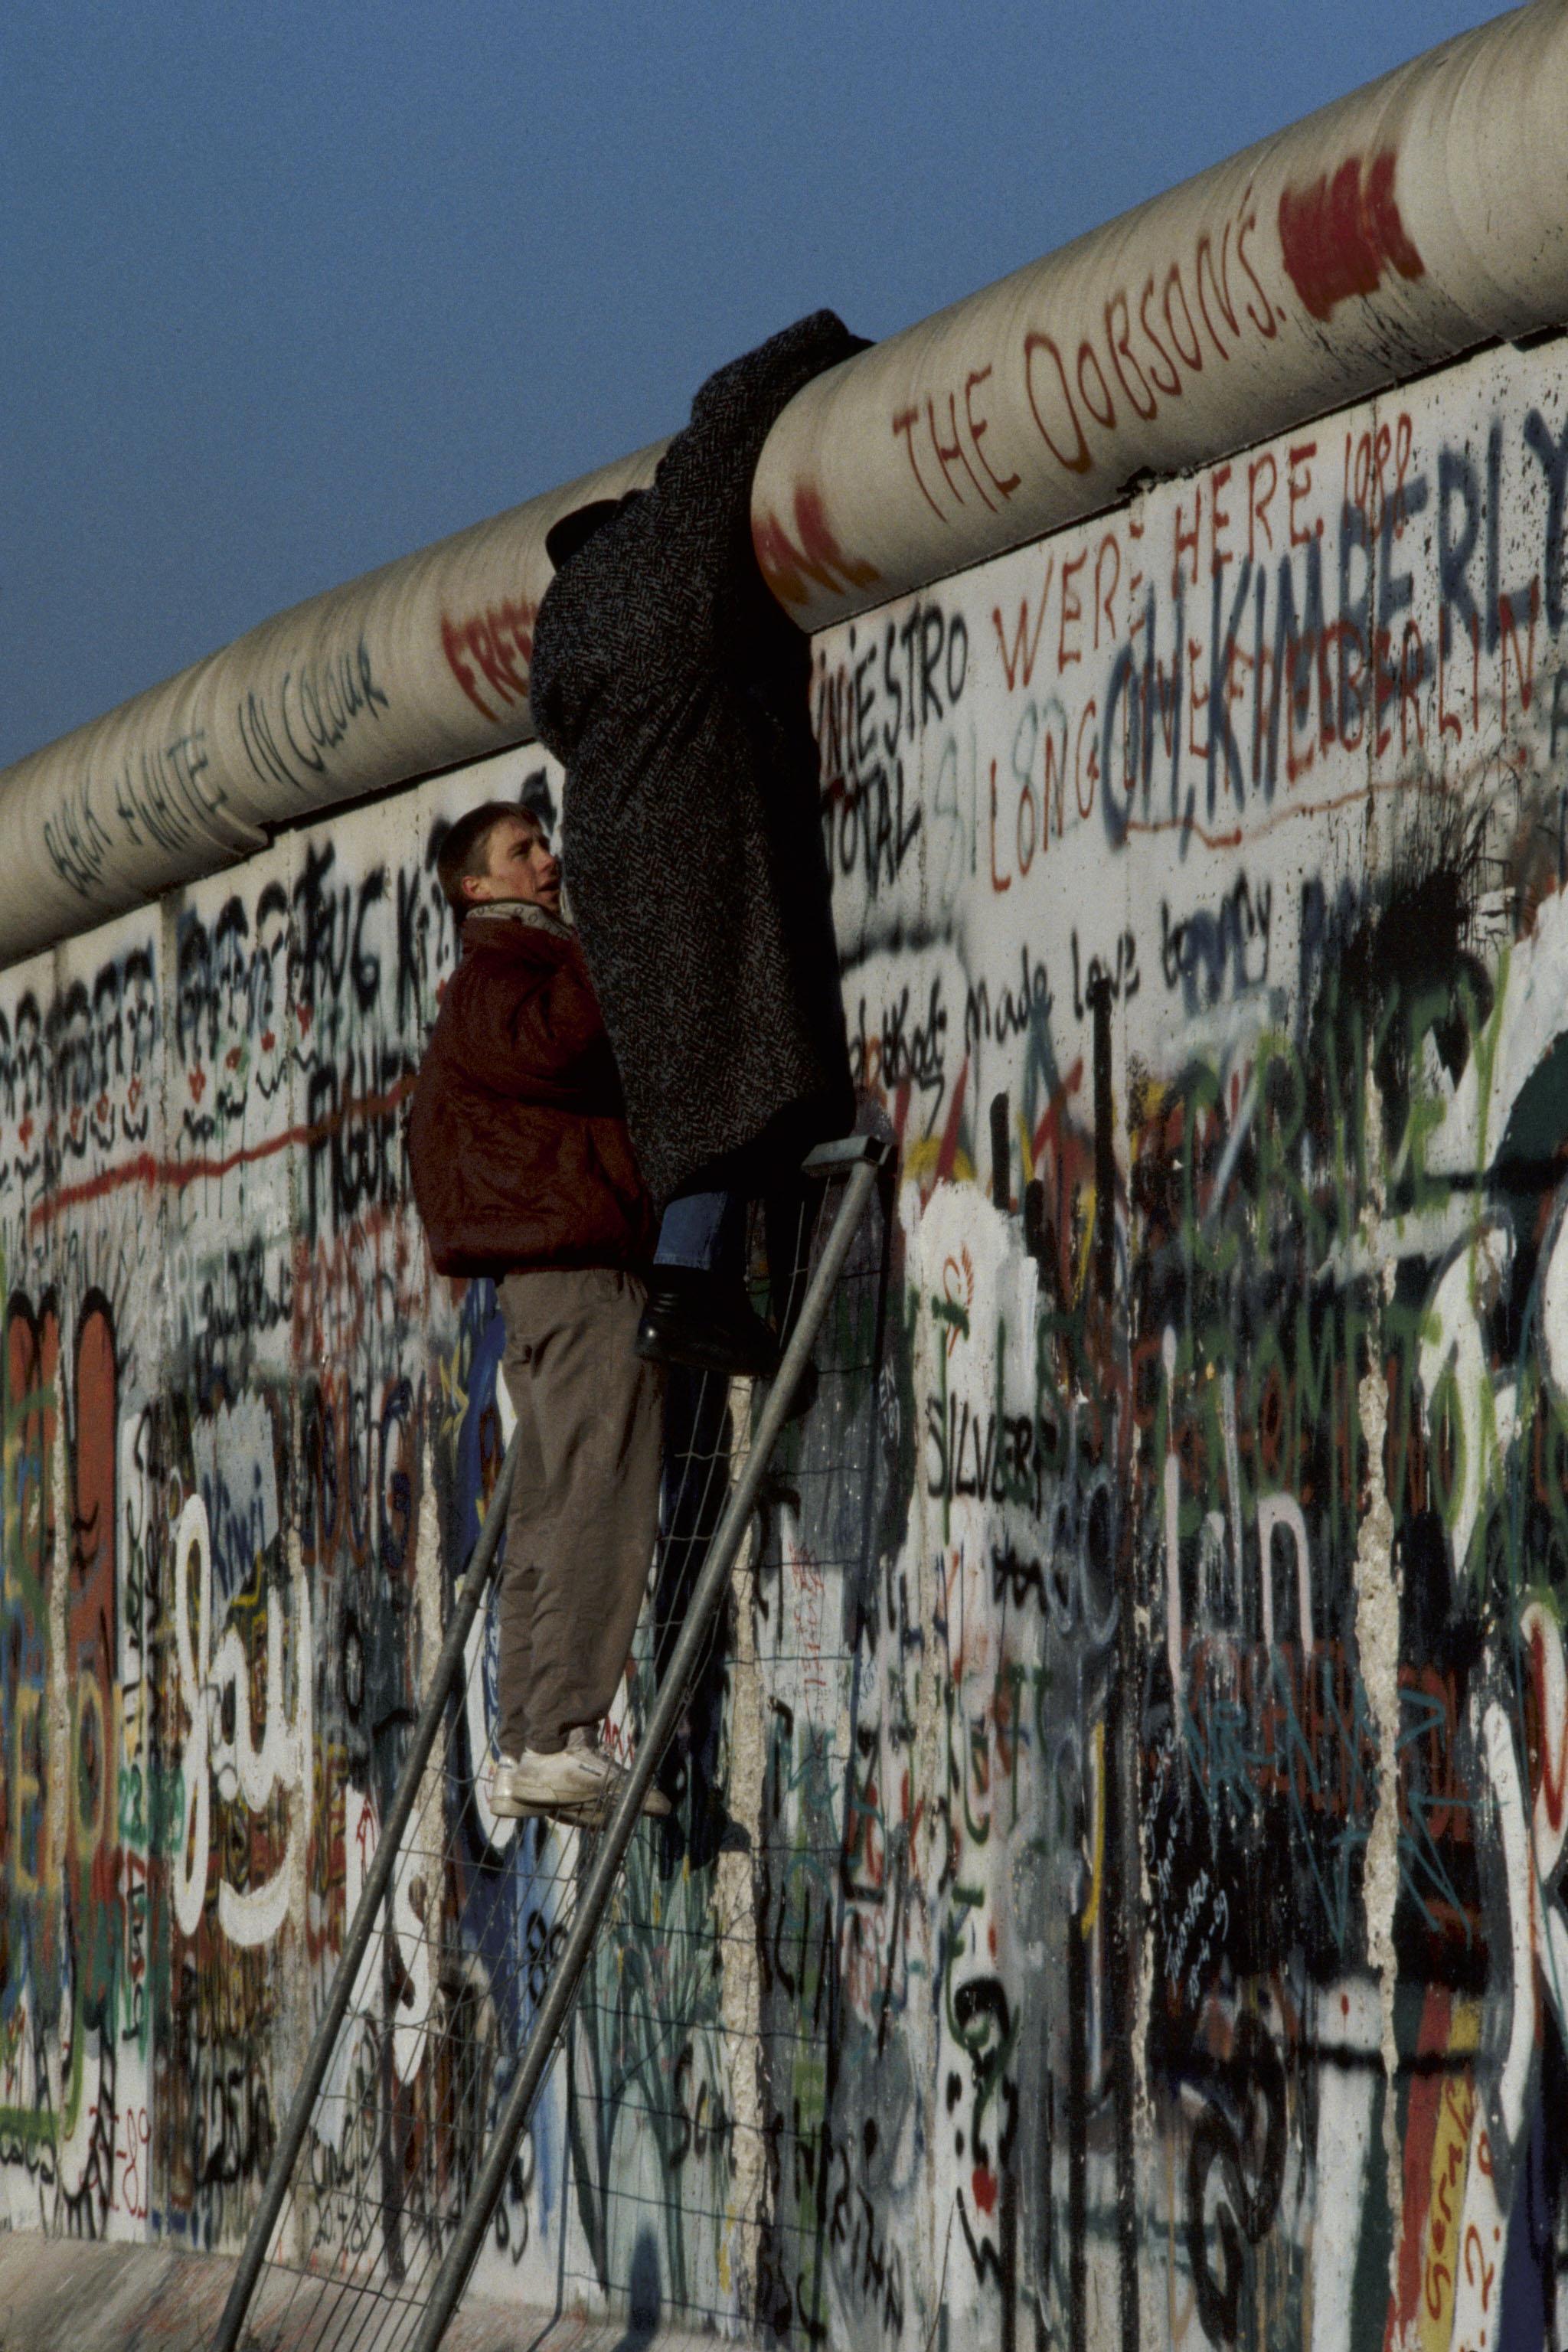 November Fall Wallpaper Nato Media Library Fall Of The Berlin Wall 1 November 1989